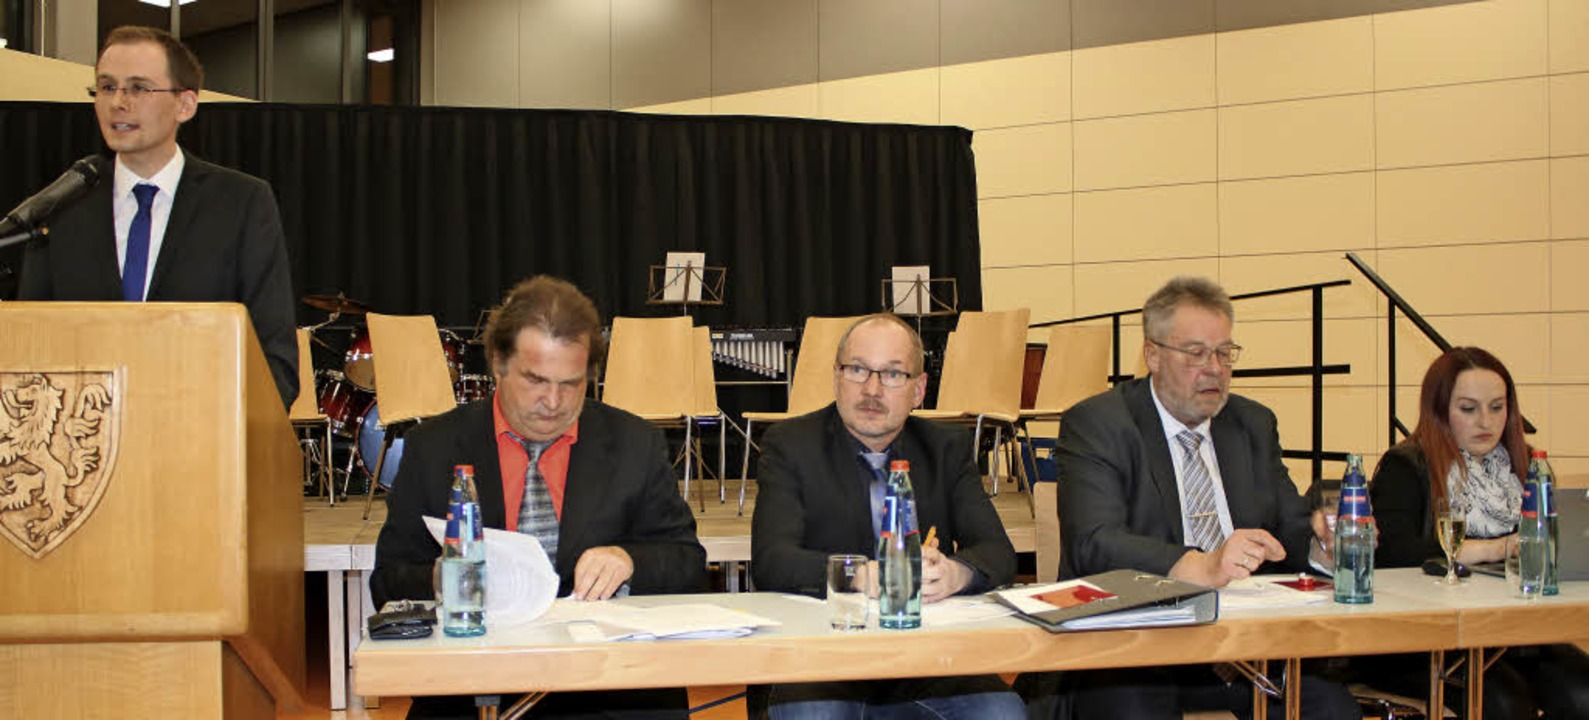 Das Präsidium des Blasmusikverbands Ho...ftführerin Carolin Müller (von links).  | Foto: Martha Weishaar